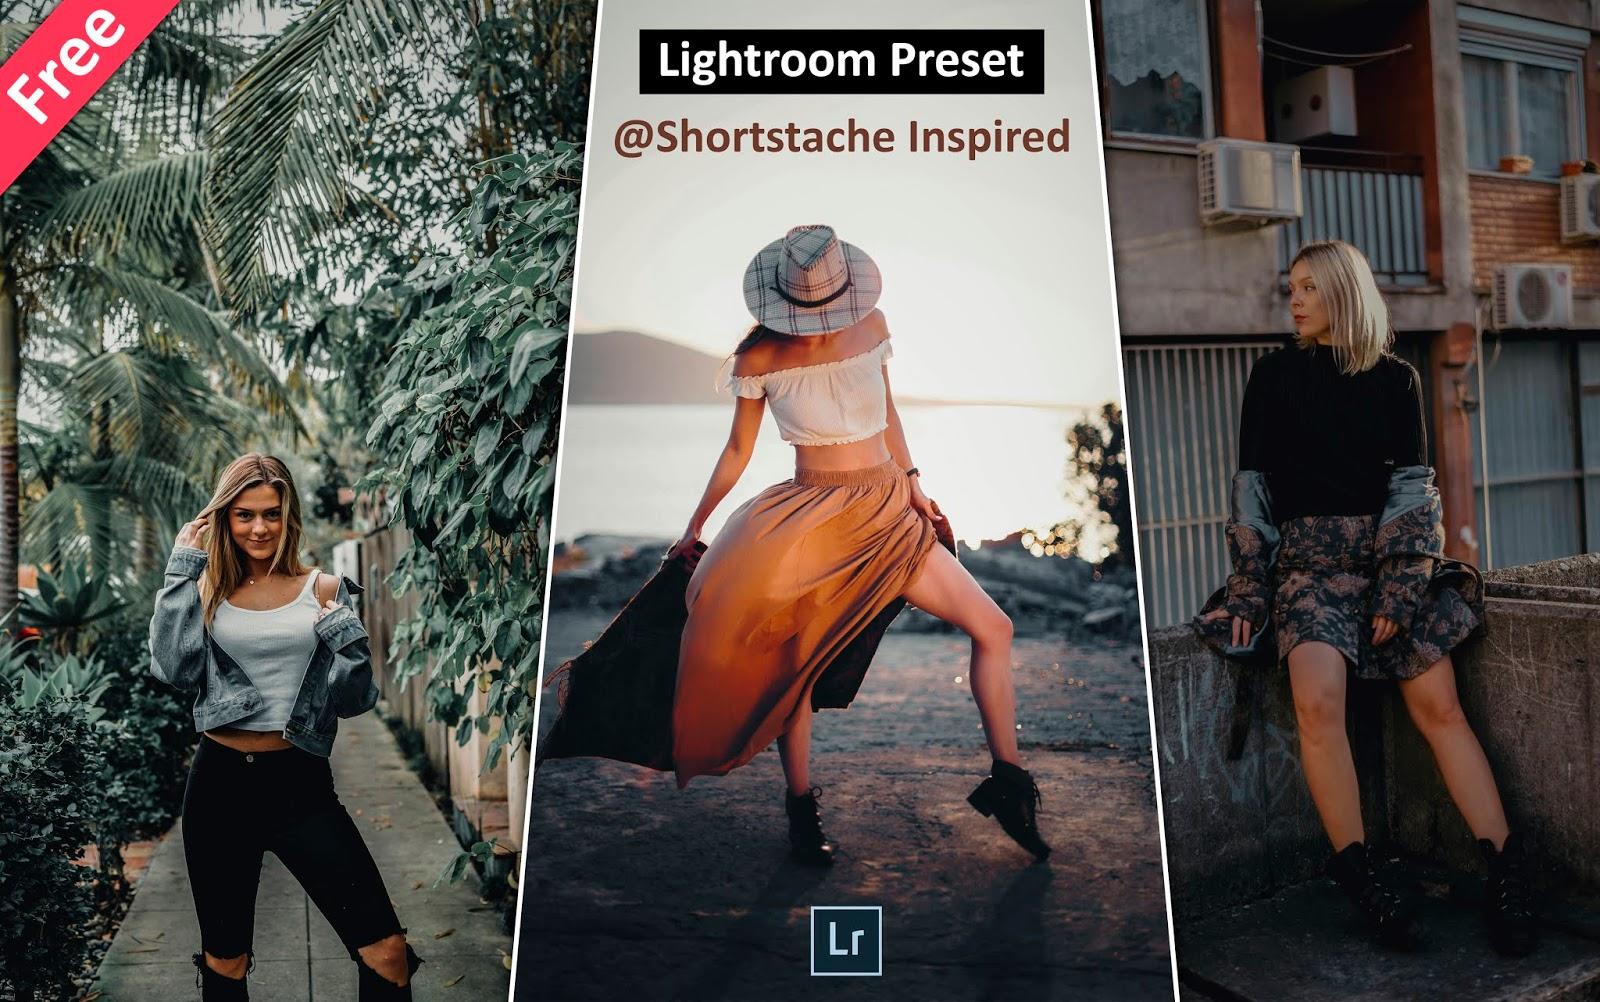 Download Shortstache Inspired Lightroom Presets for Free | How to Edit Photos Like @shortstache in Lightroom